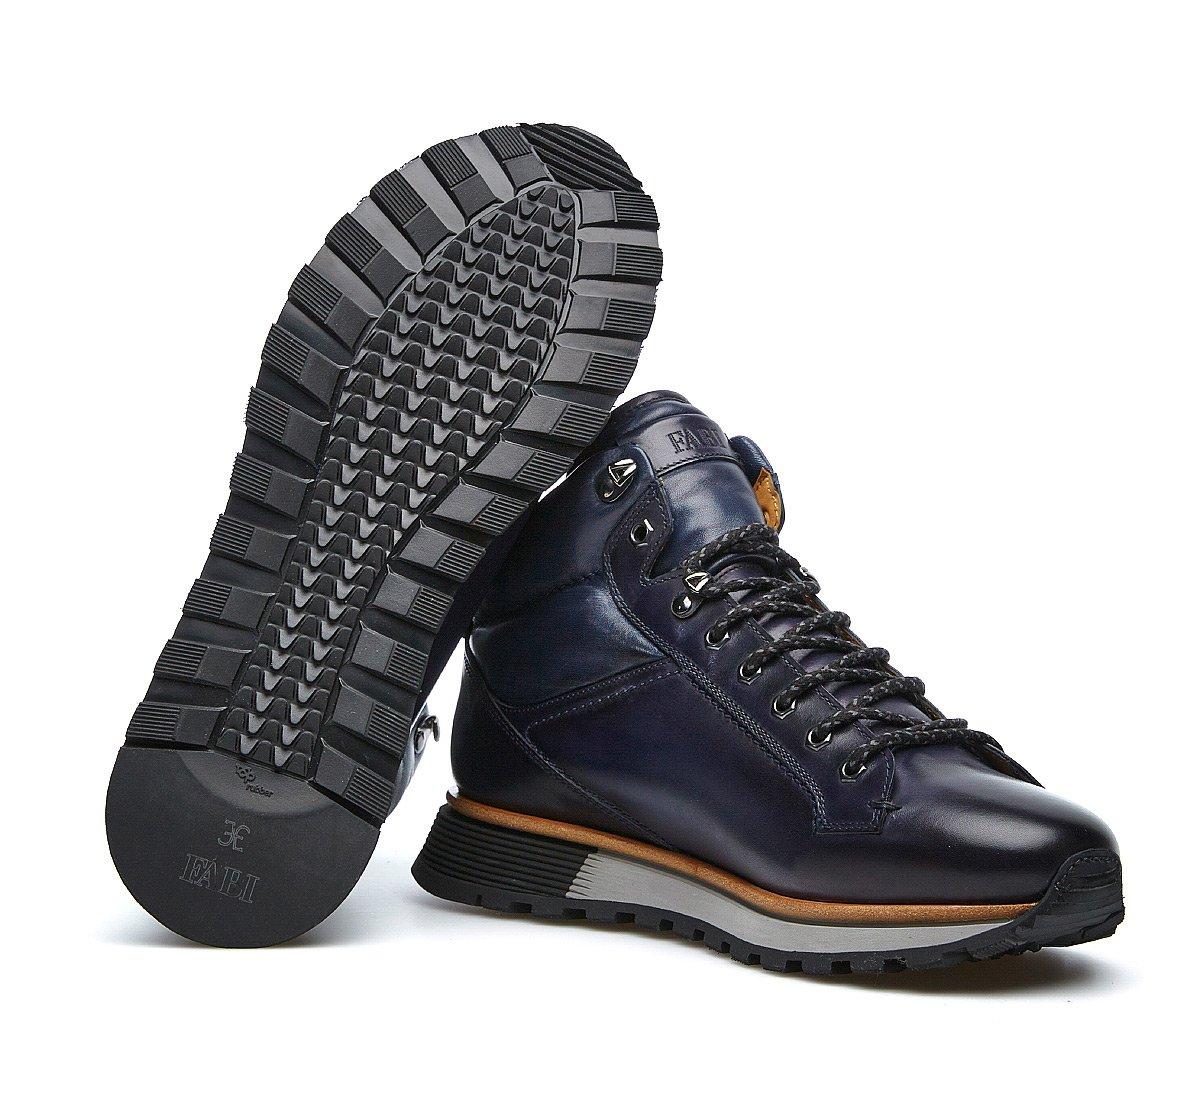 Miramonti shoe